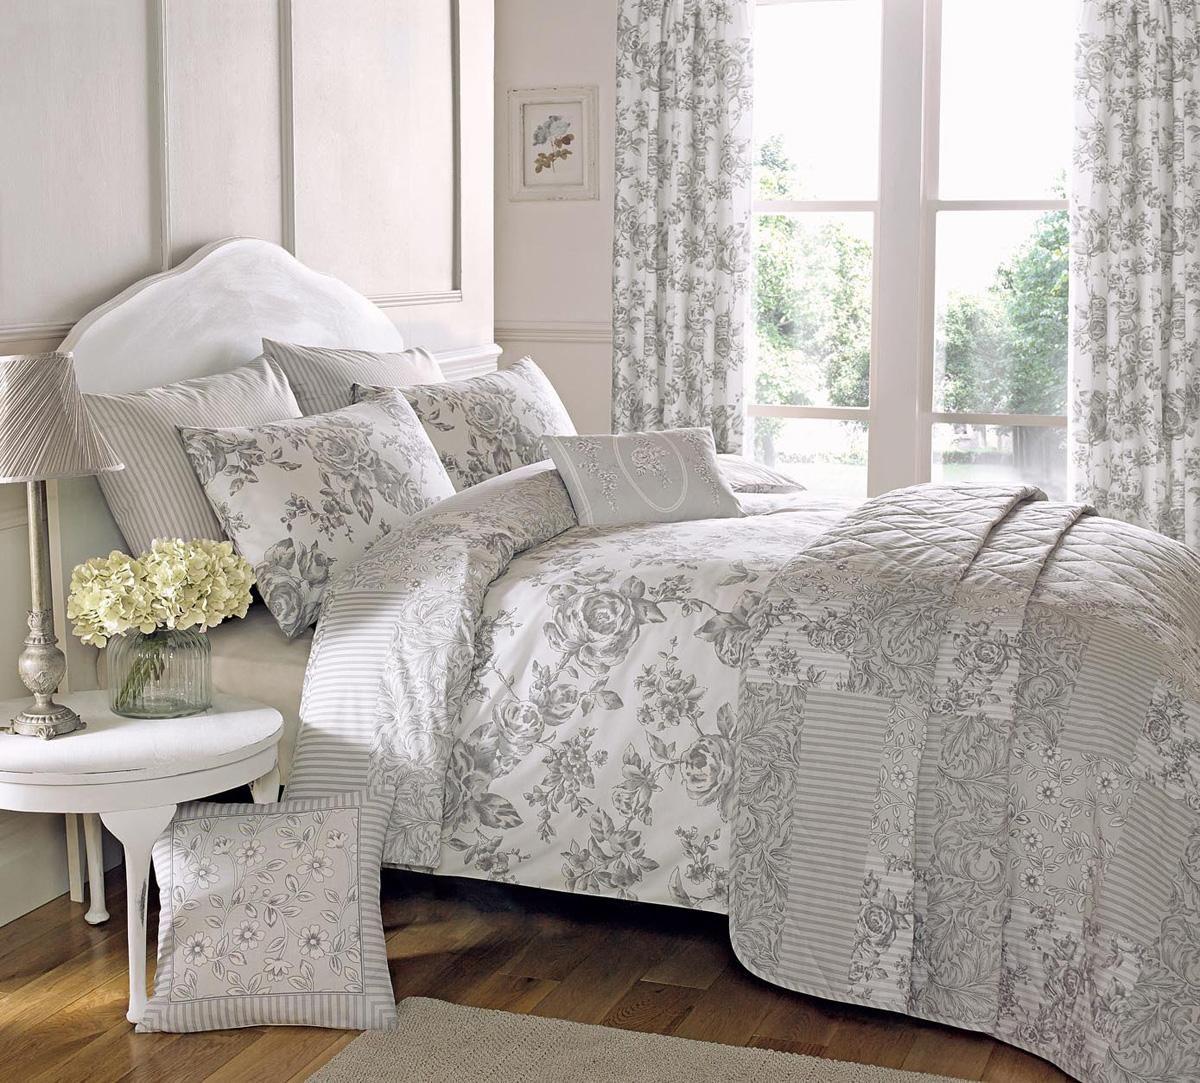 Malton Elegant Floral Design Duvet Cover Set In Slate Grey By Dreams N  Drapes   Double By Dreams U0027nu0027 Drapes